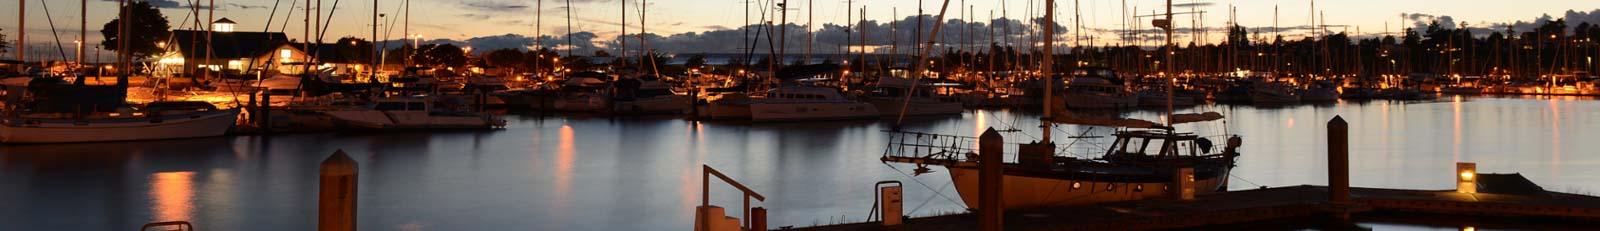 Bellingham Waterfront Market Statistics